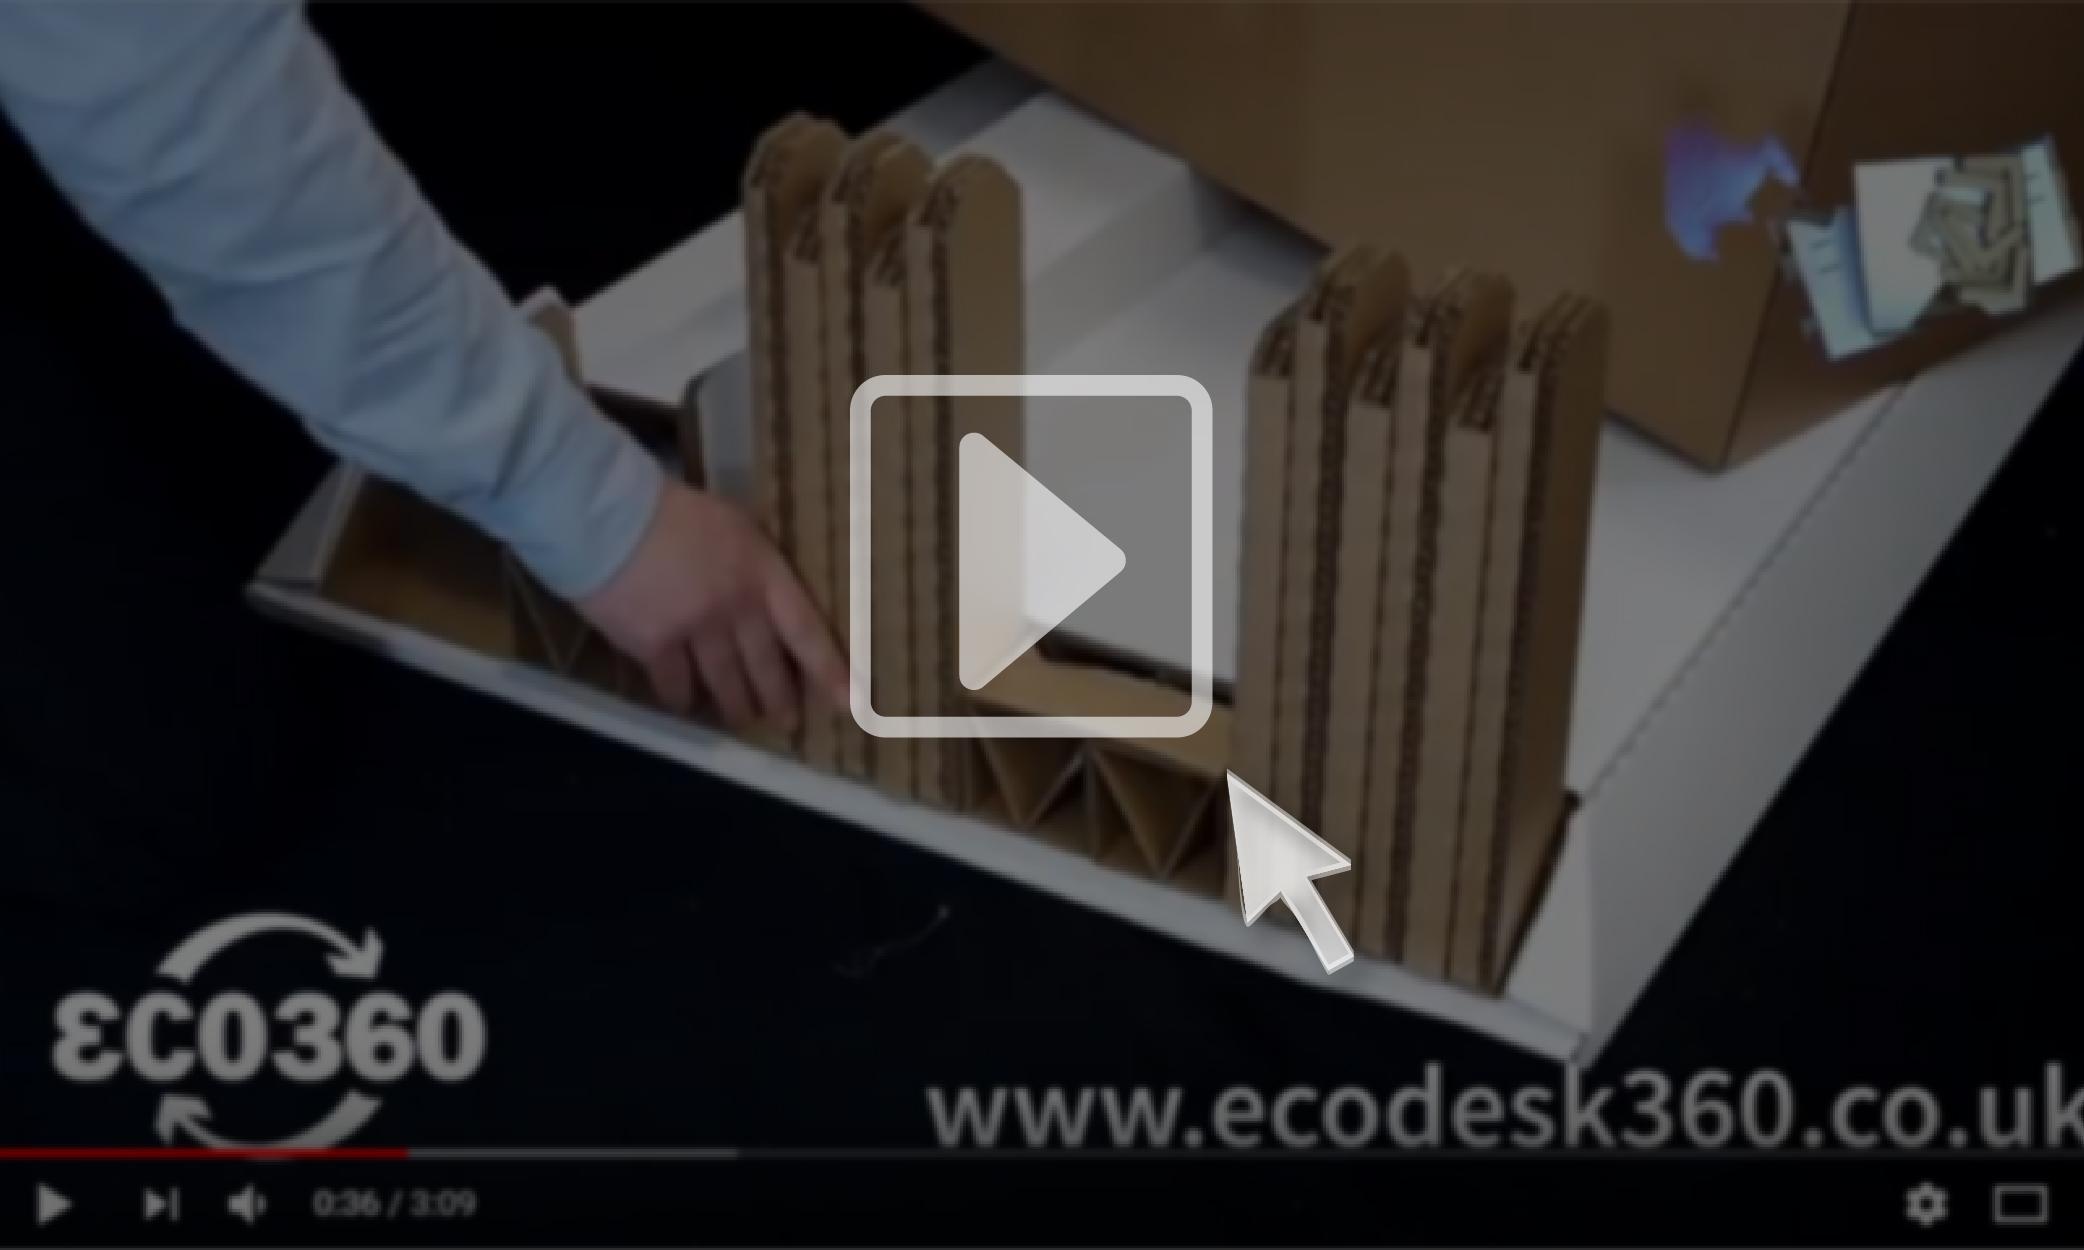 ECO360 cardboard desk assembly instruction video